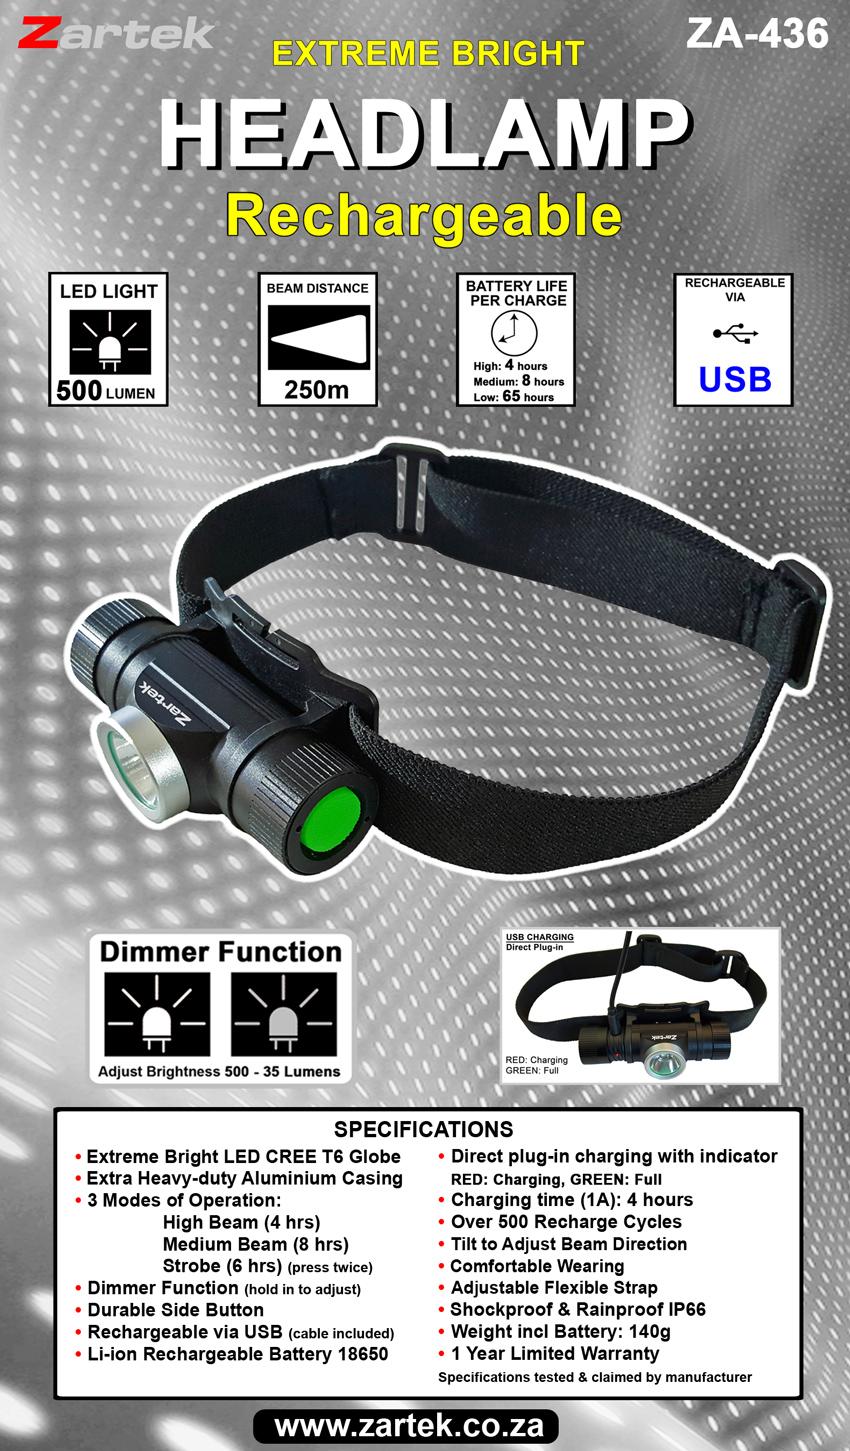 https://www.zartek.co.za/images/zartek/products/led_headlamps/za436/ZA436-USB-Headlamp.jpg